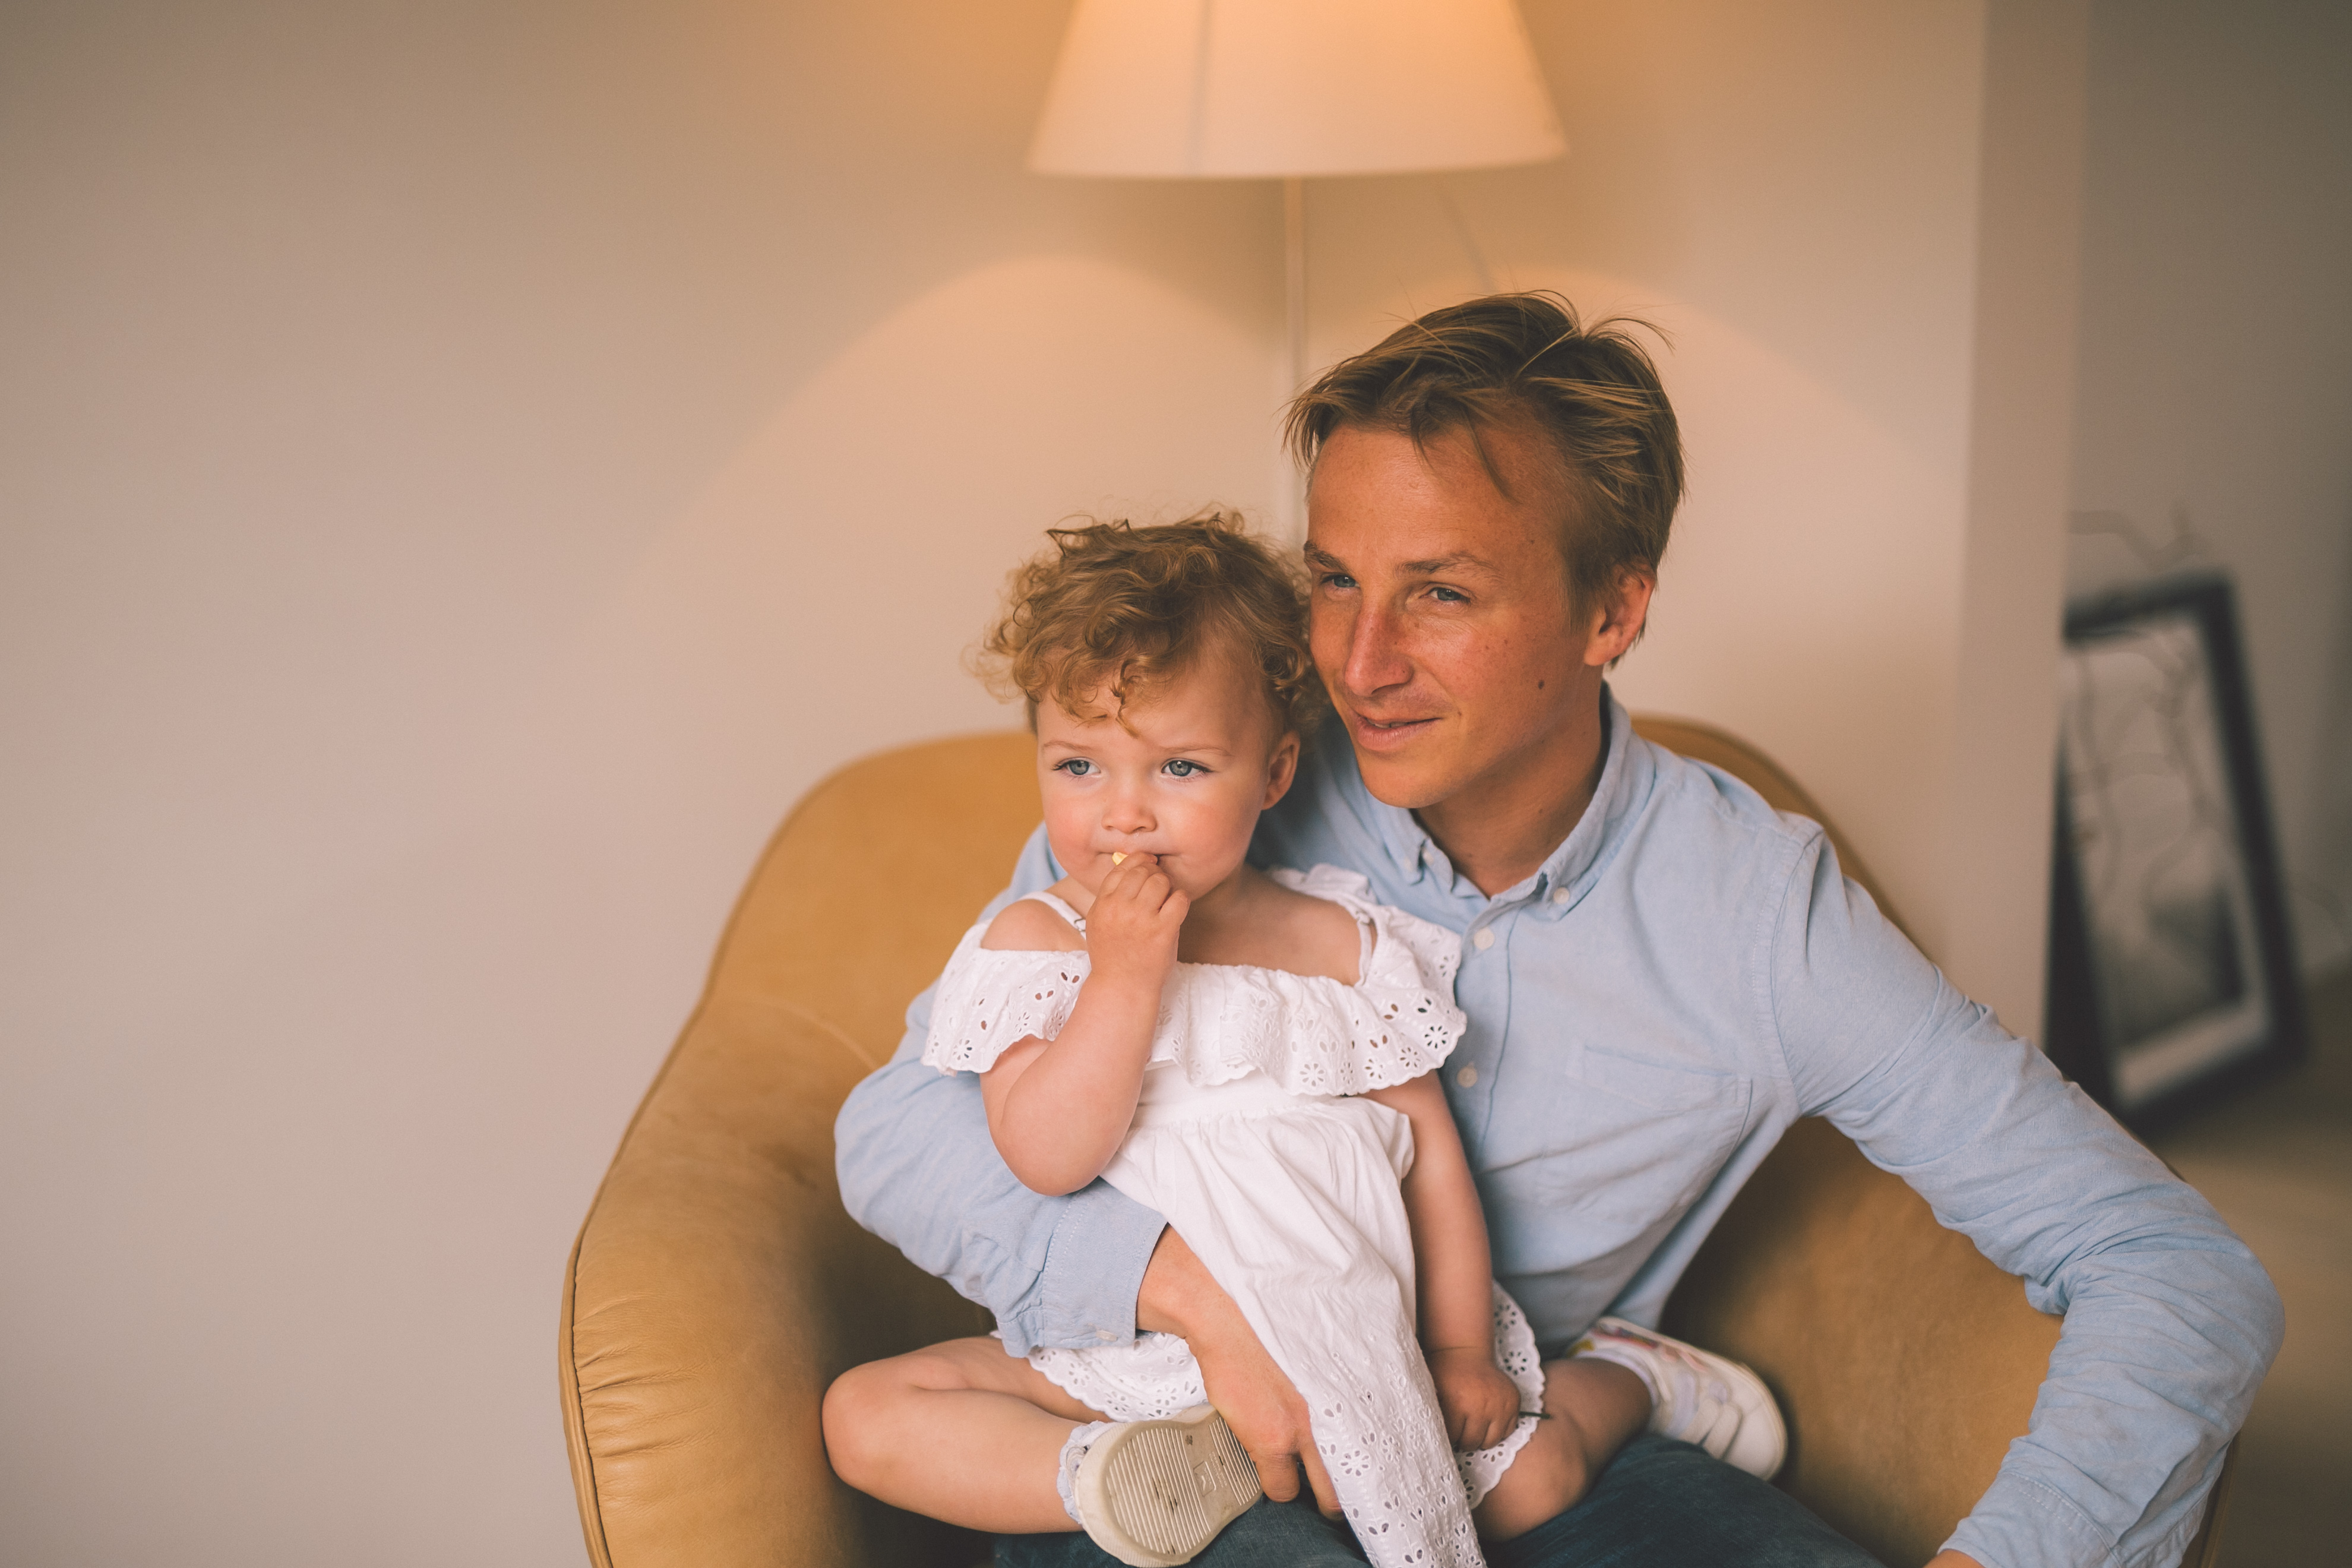 FAMILIE DE MULDER-5886